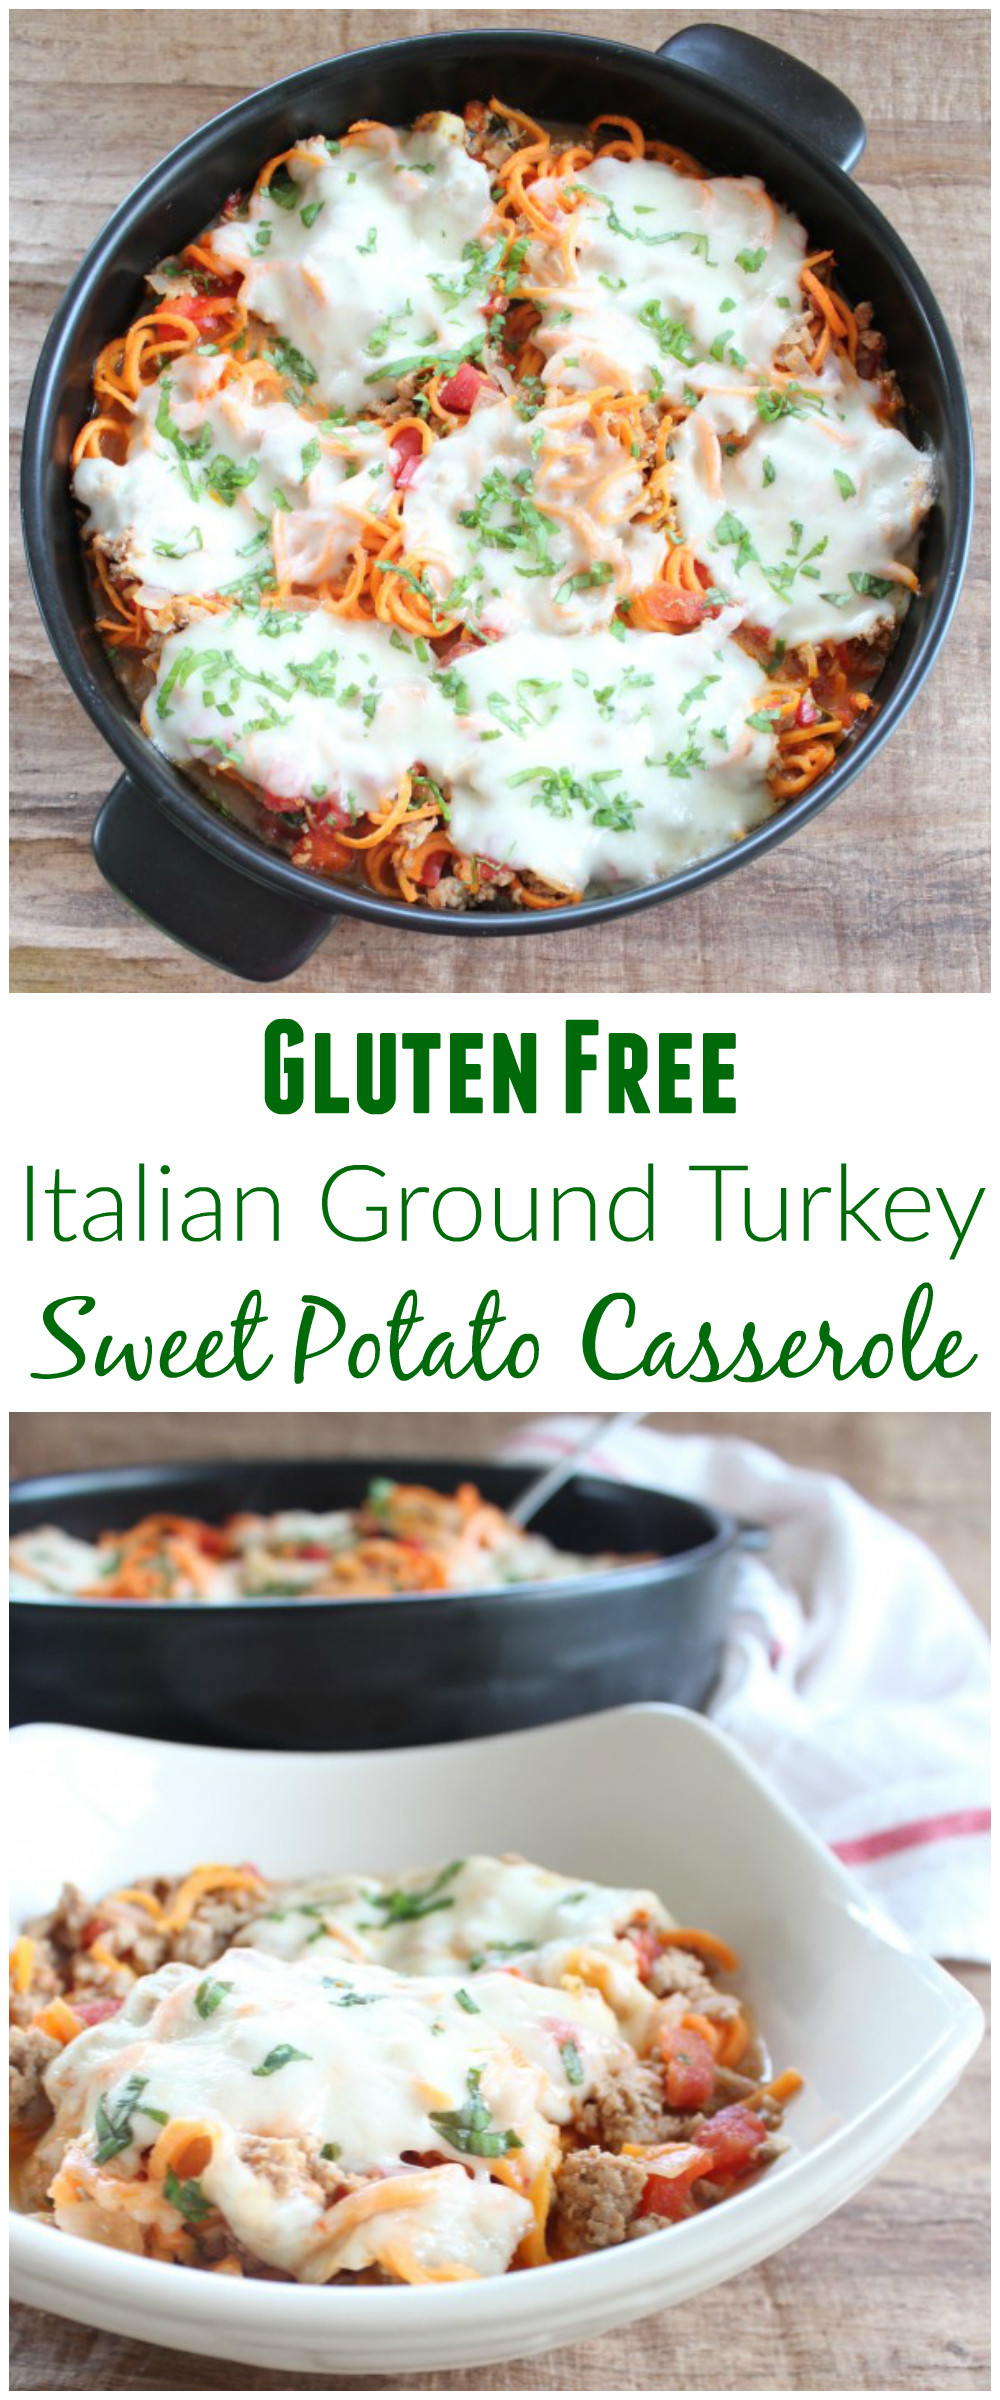 Gluten Free Sweet Potato Casserole  Gluten Free Italian Turkey Sweet Potato Casserole